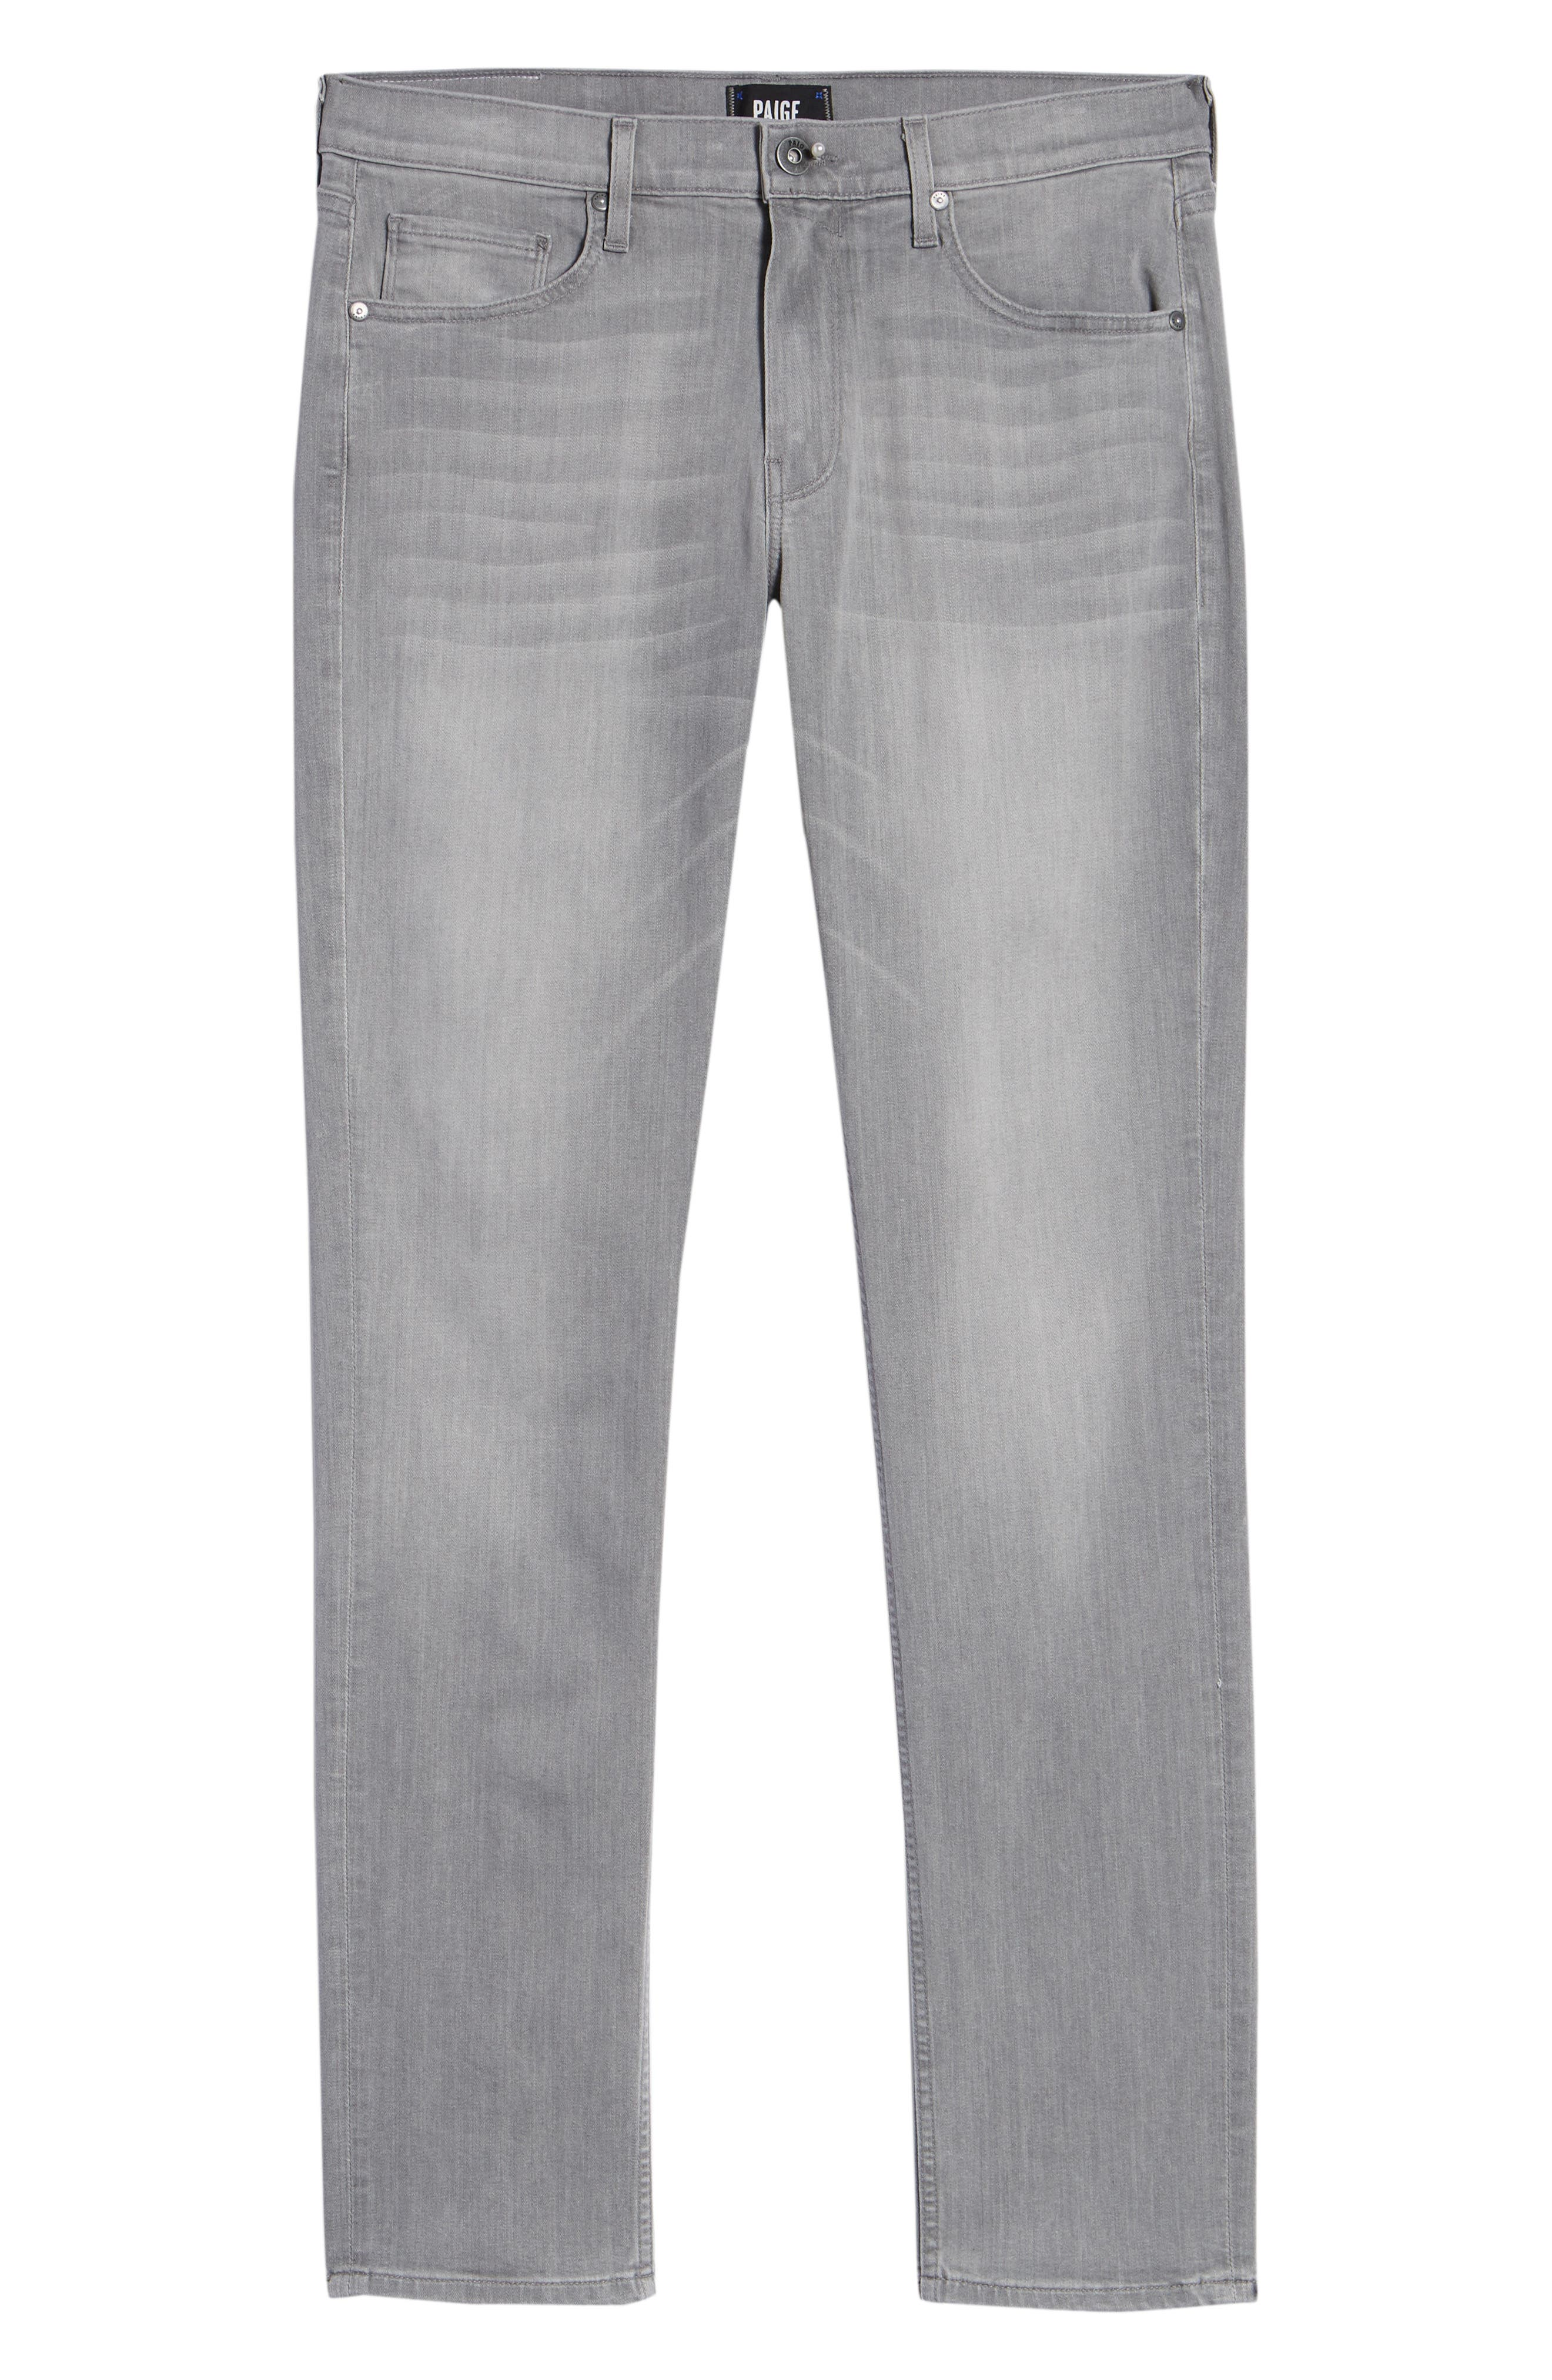 Transcend - Lennox Slim Fit Jeans,                             Alternate thumbnail 6, color,                             Mannor